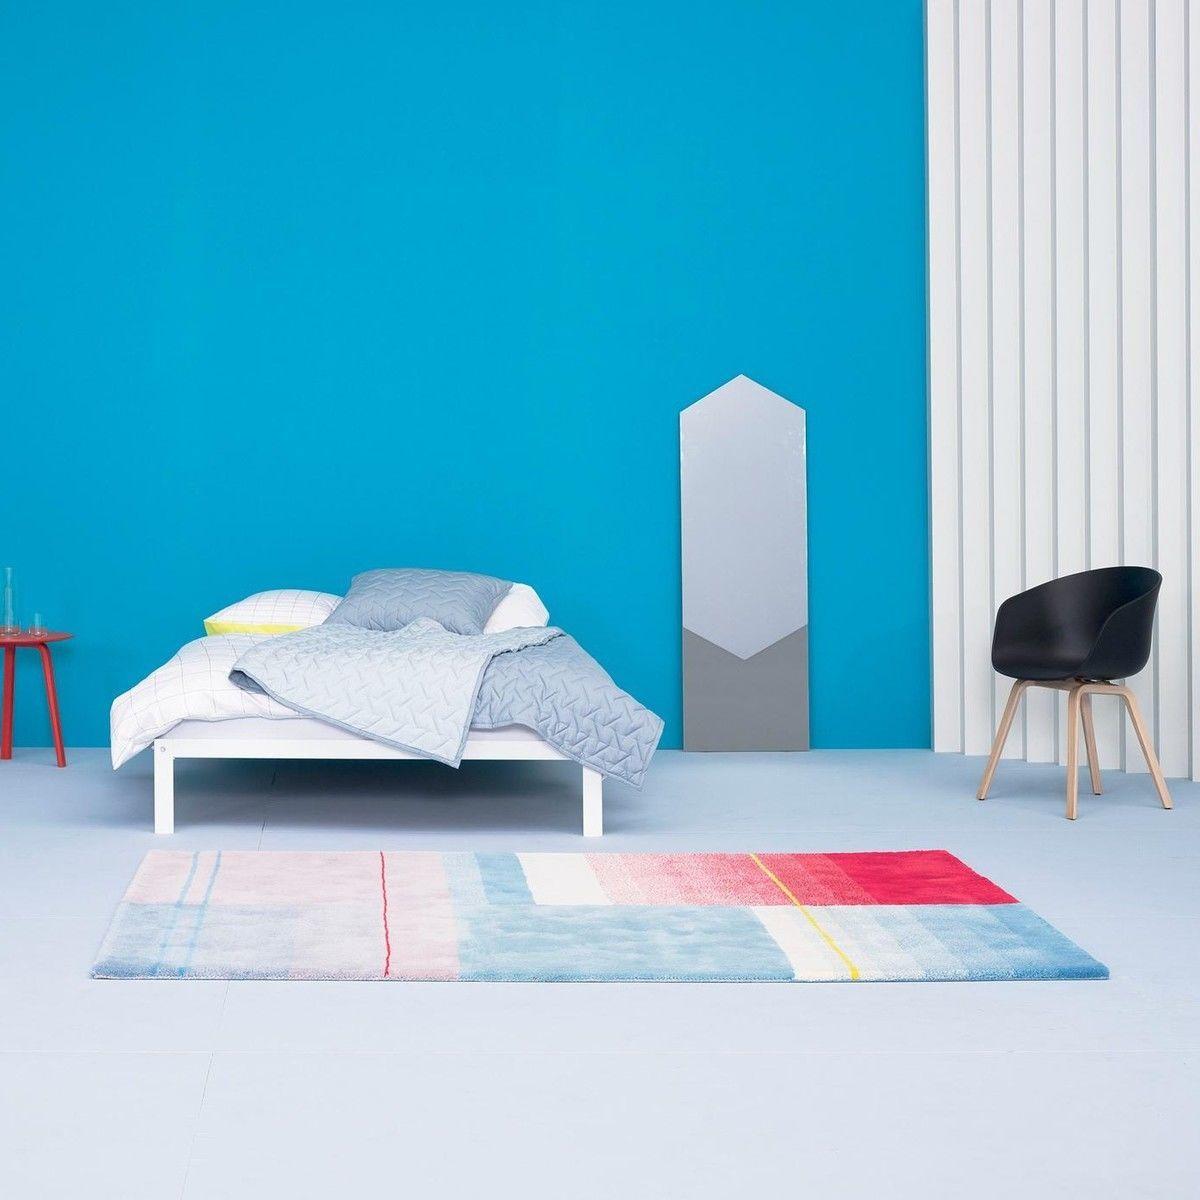 s b colour carpet hay. Black Bedroom Furniture Sets. Home Design Ideas